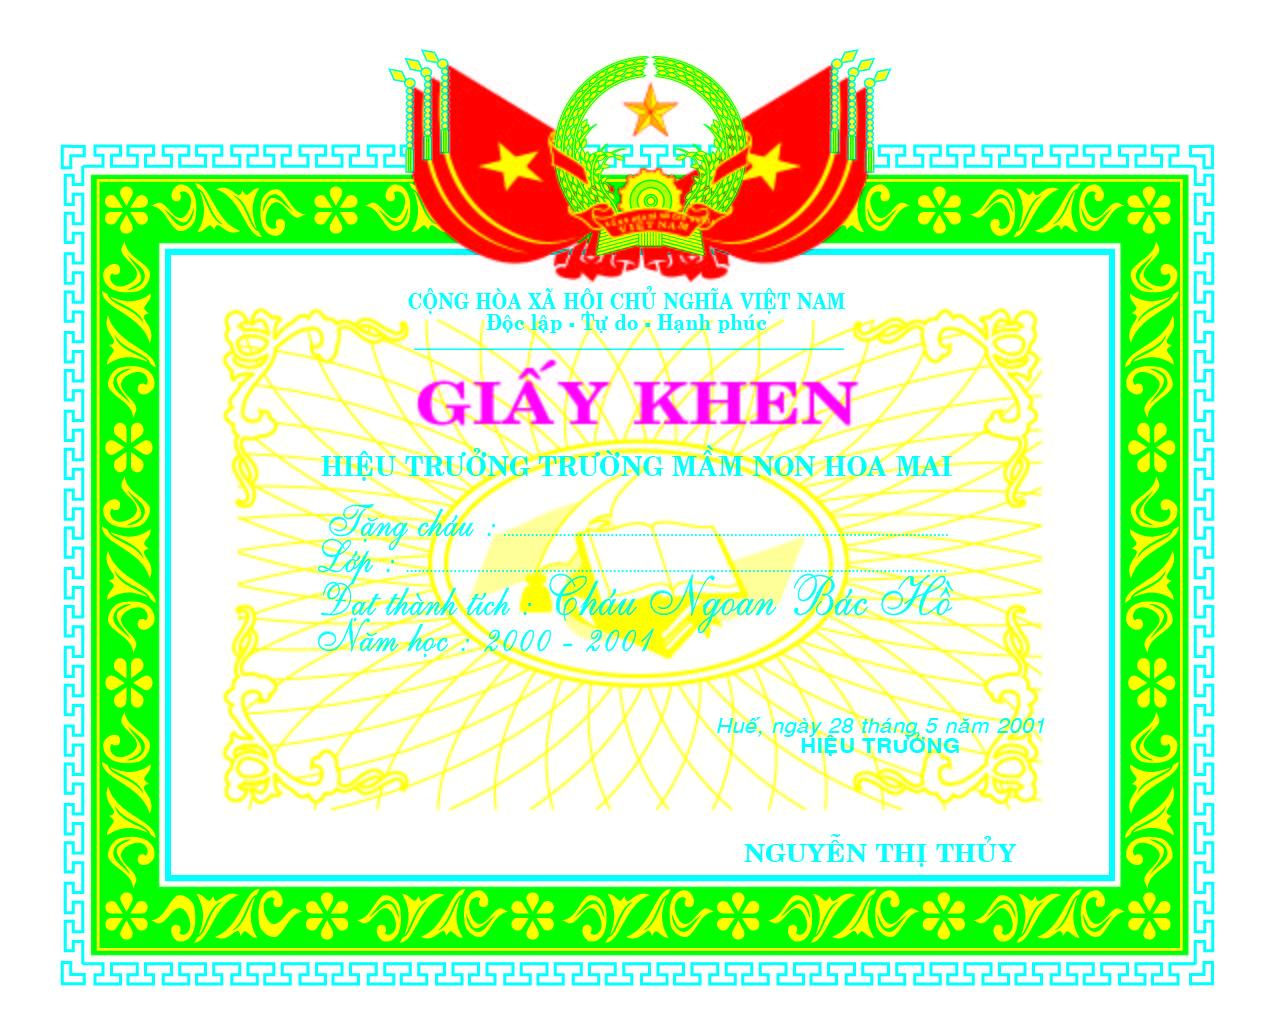 Mẫu giấy khen 036 - Mẫu giấy khen trường mầm non - link download : https://adsnew.net/UyLV